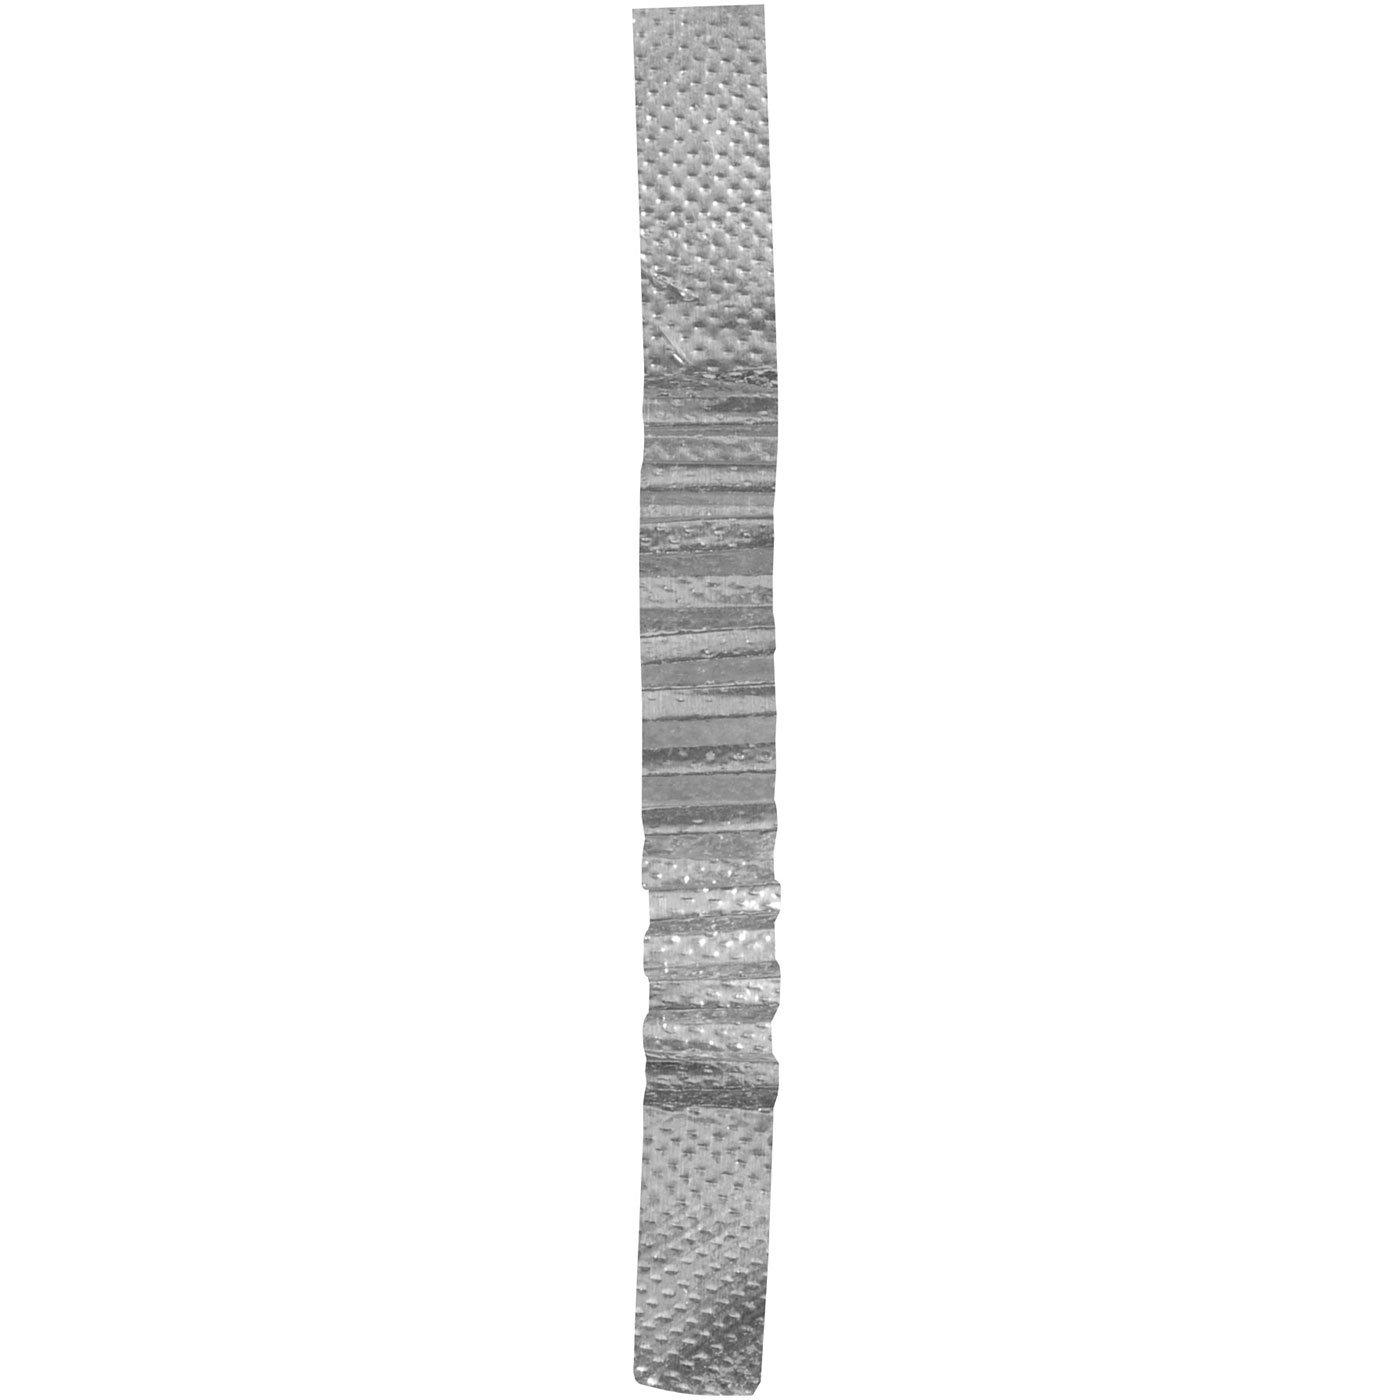 Aurum Cantus G2 Replacement Ribbon